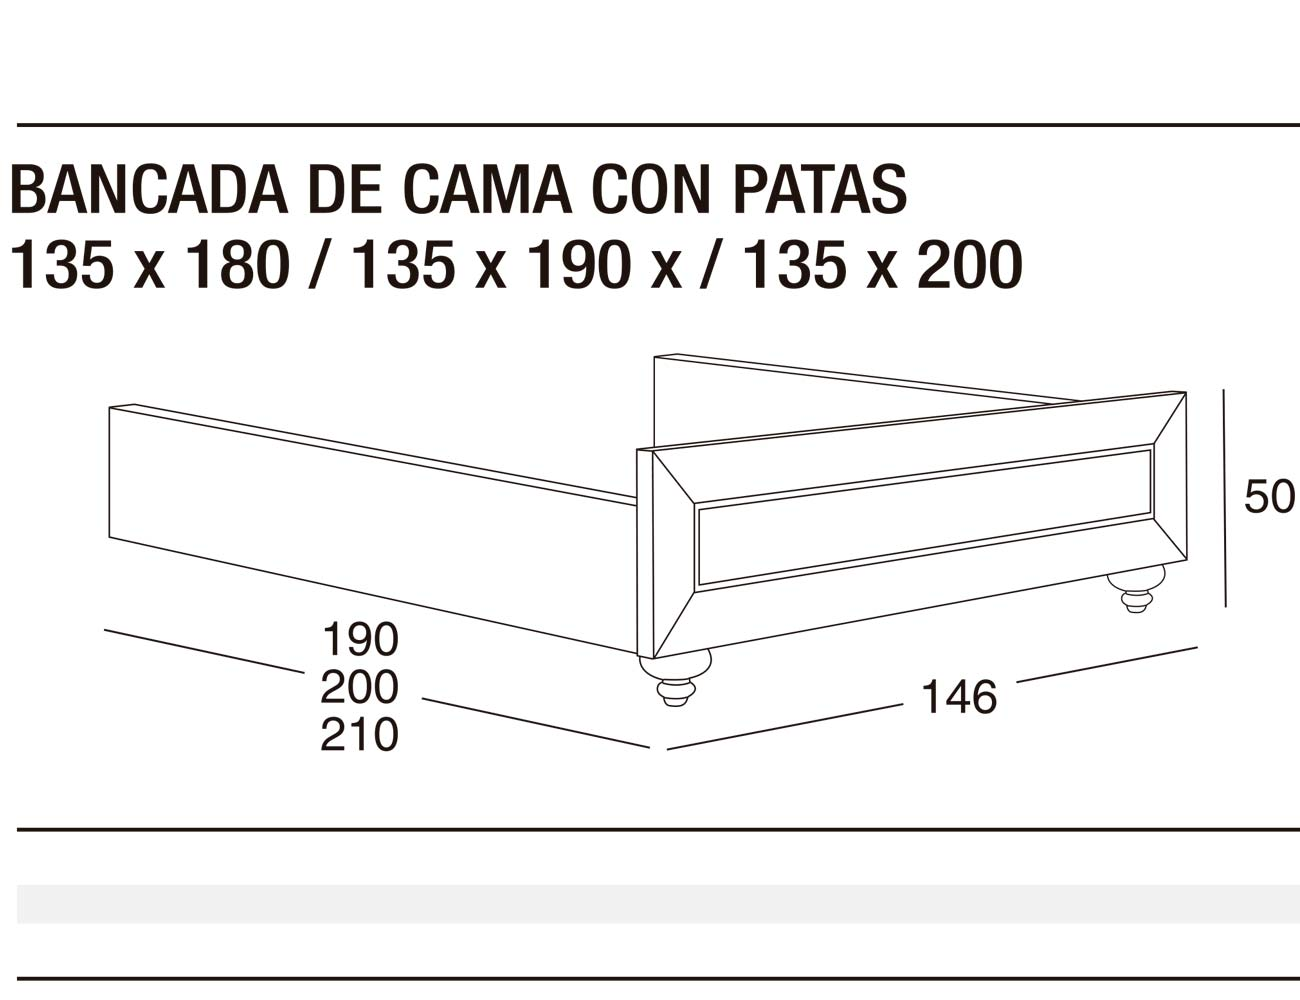 Bancada cama p 135x180 135x190 135x200